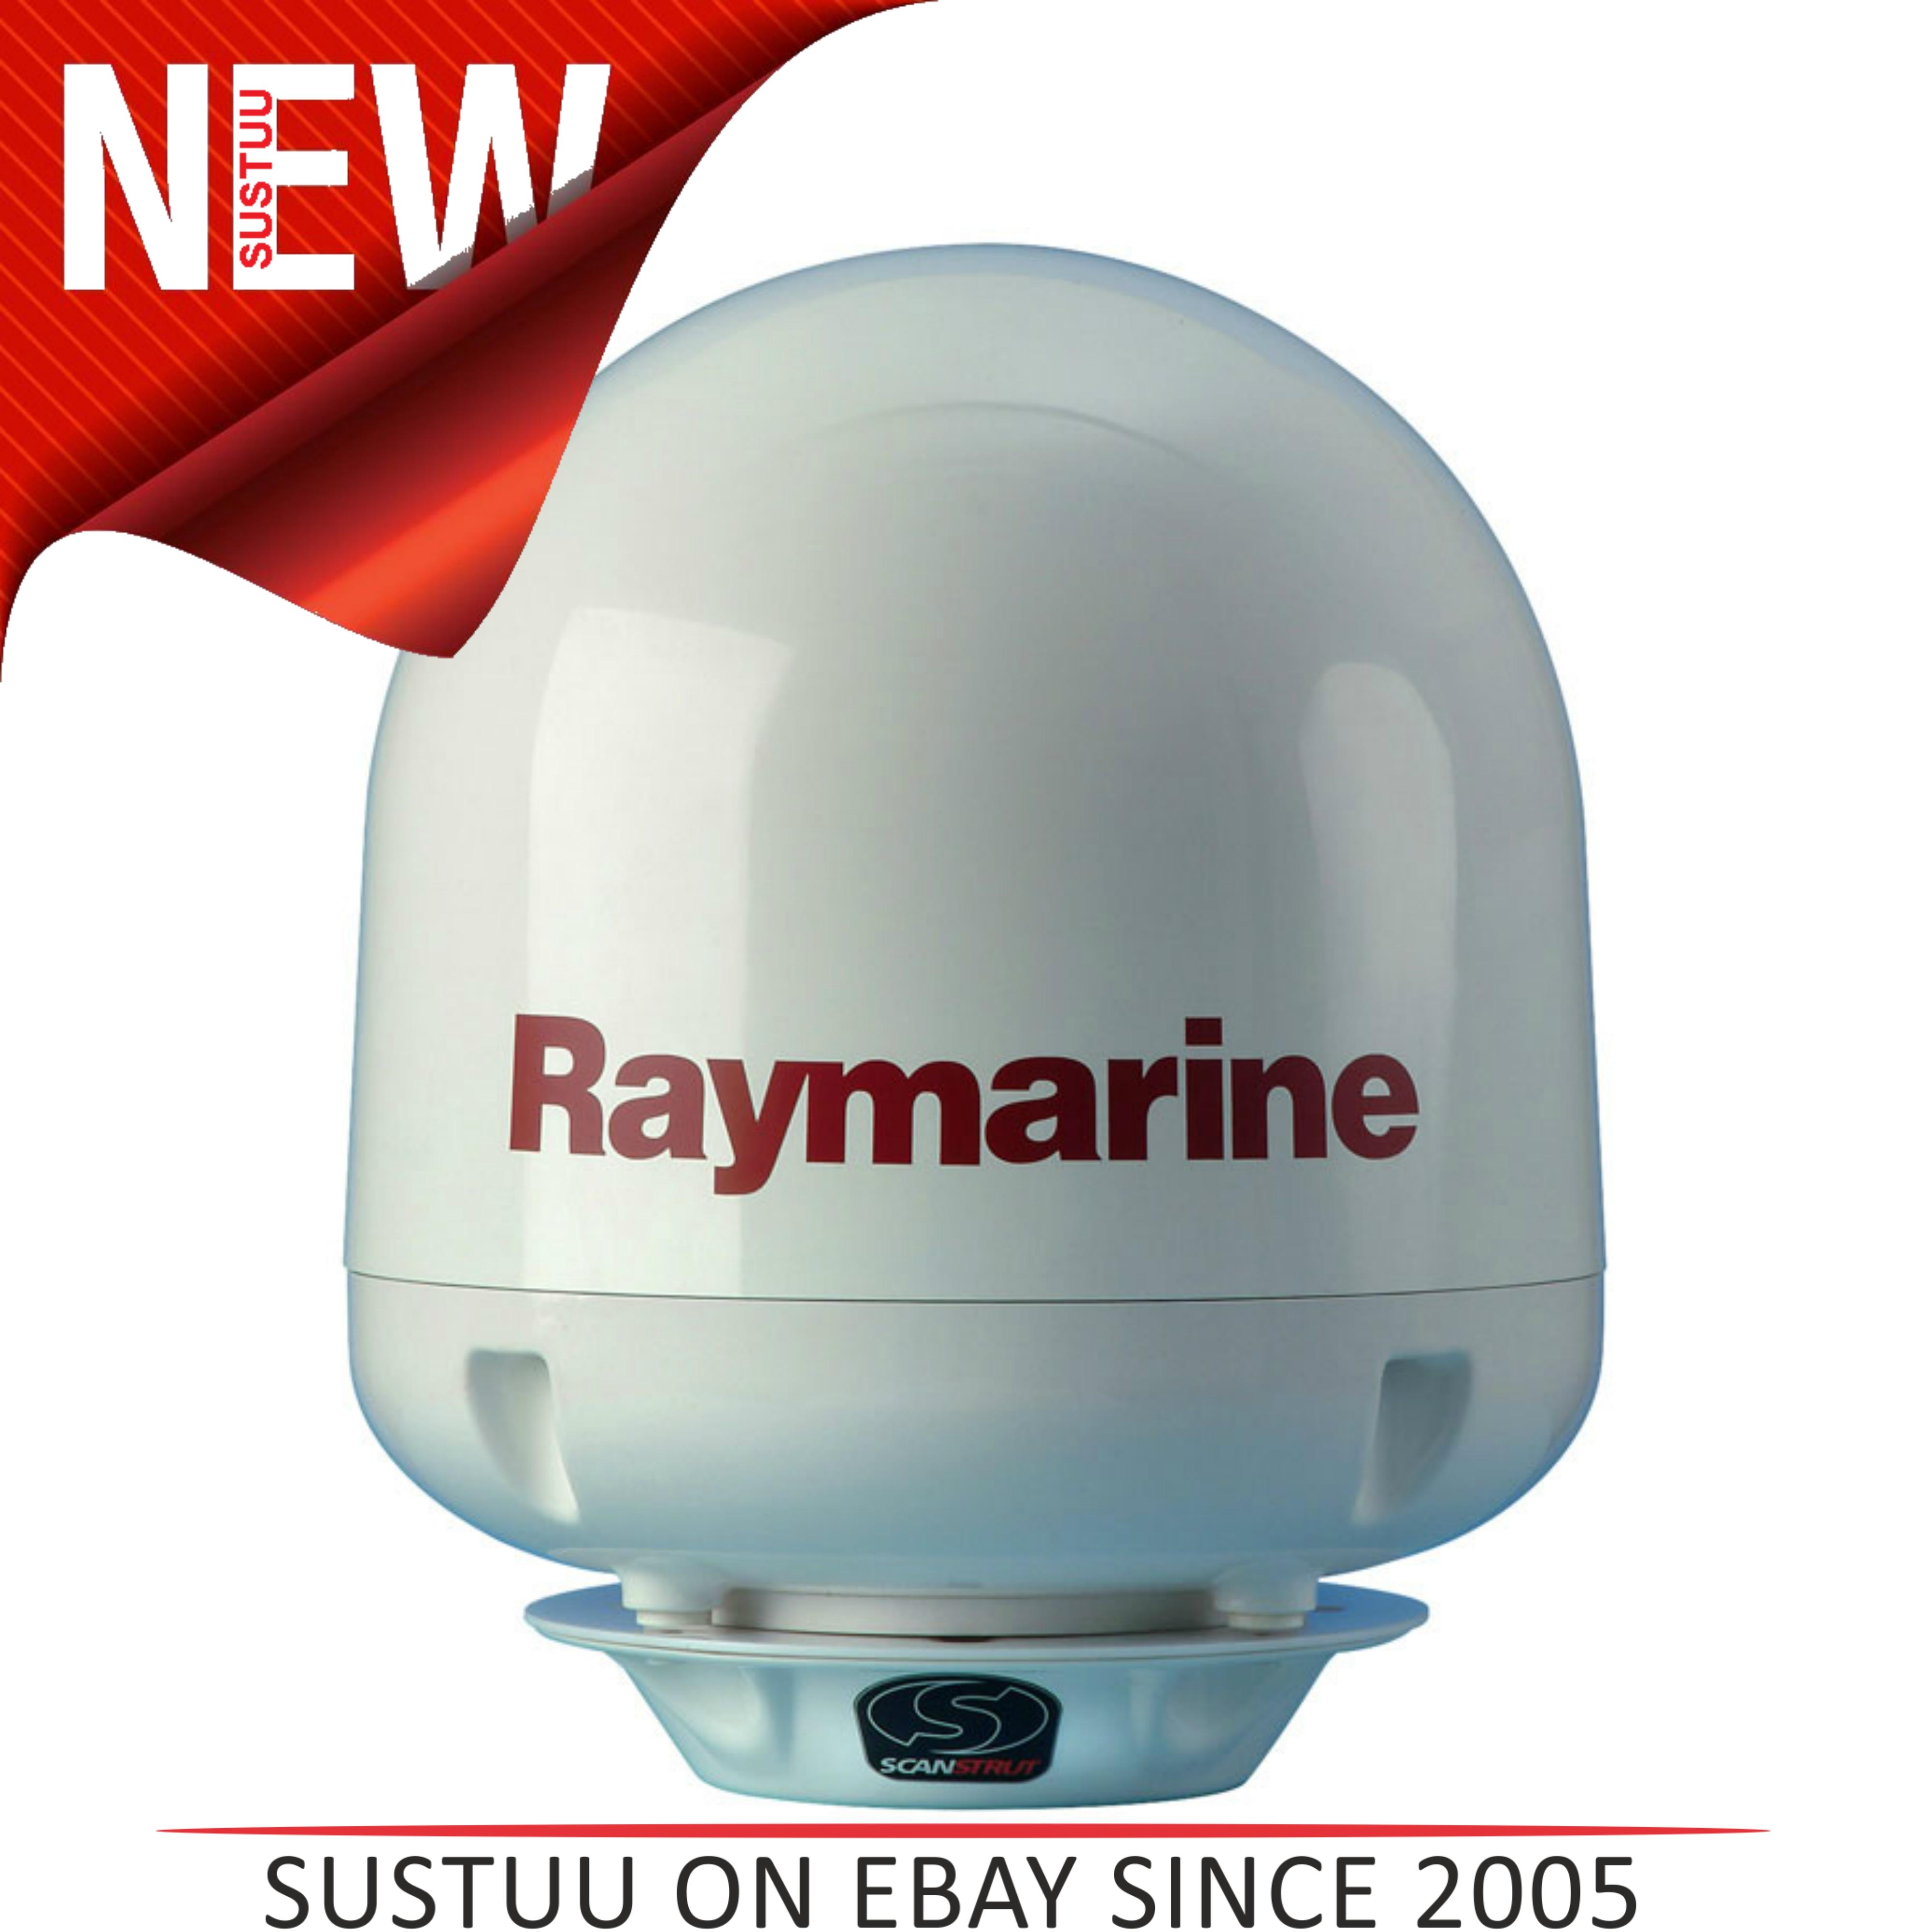 Scanstrut SC45R Satcom Mount for Raymarine STV45 Intellian i4 Satcom/TV Antennas